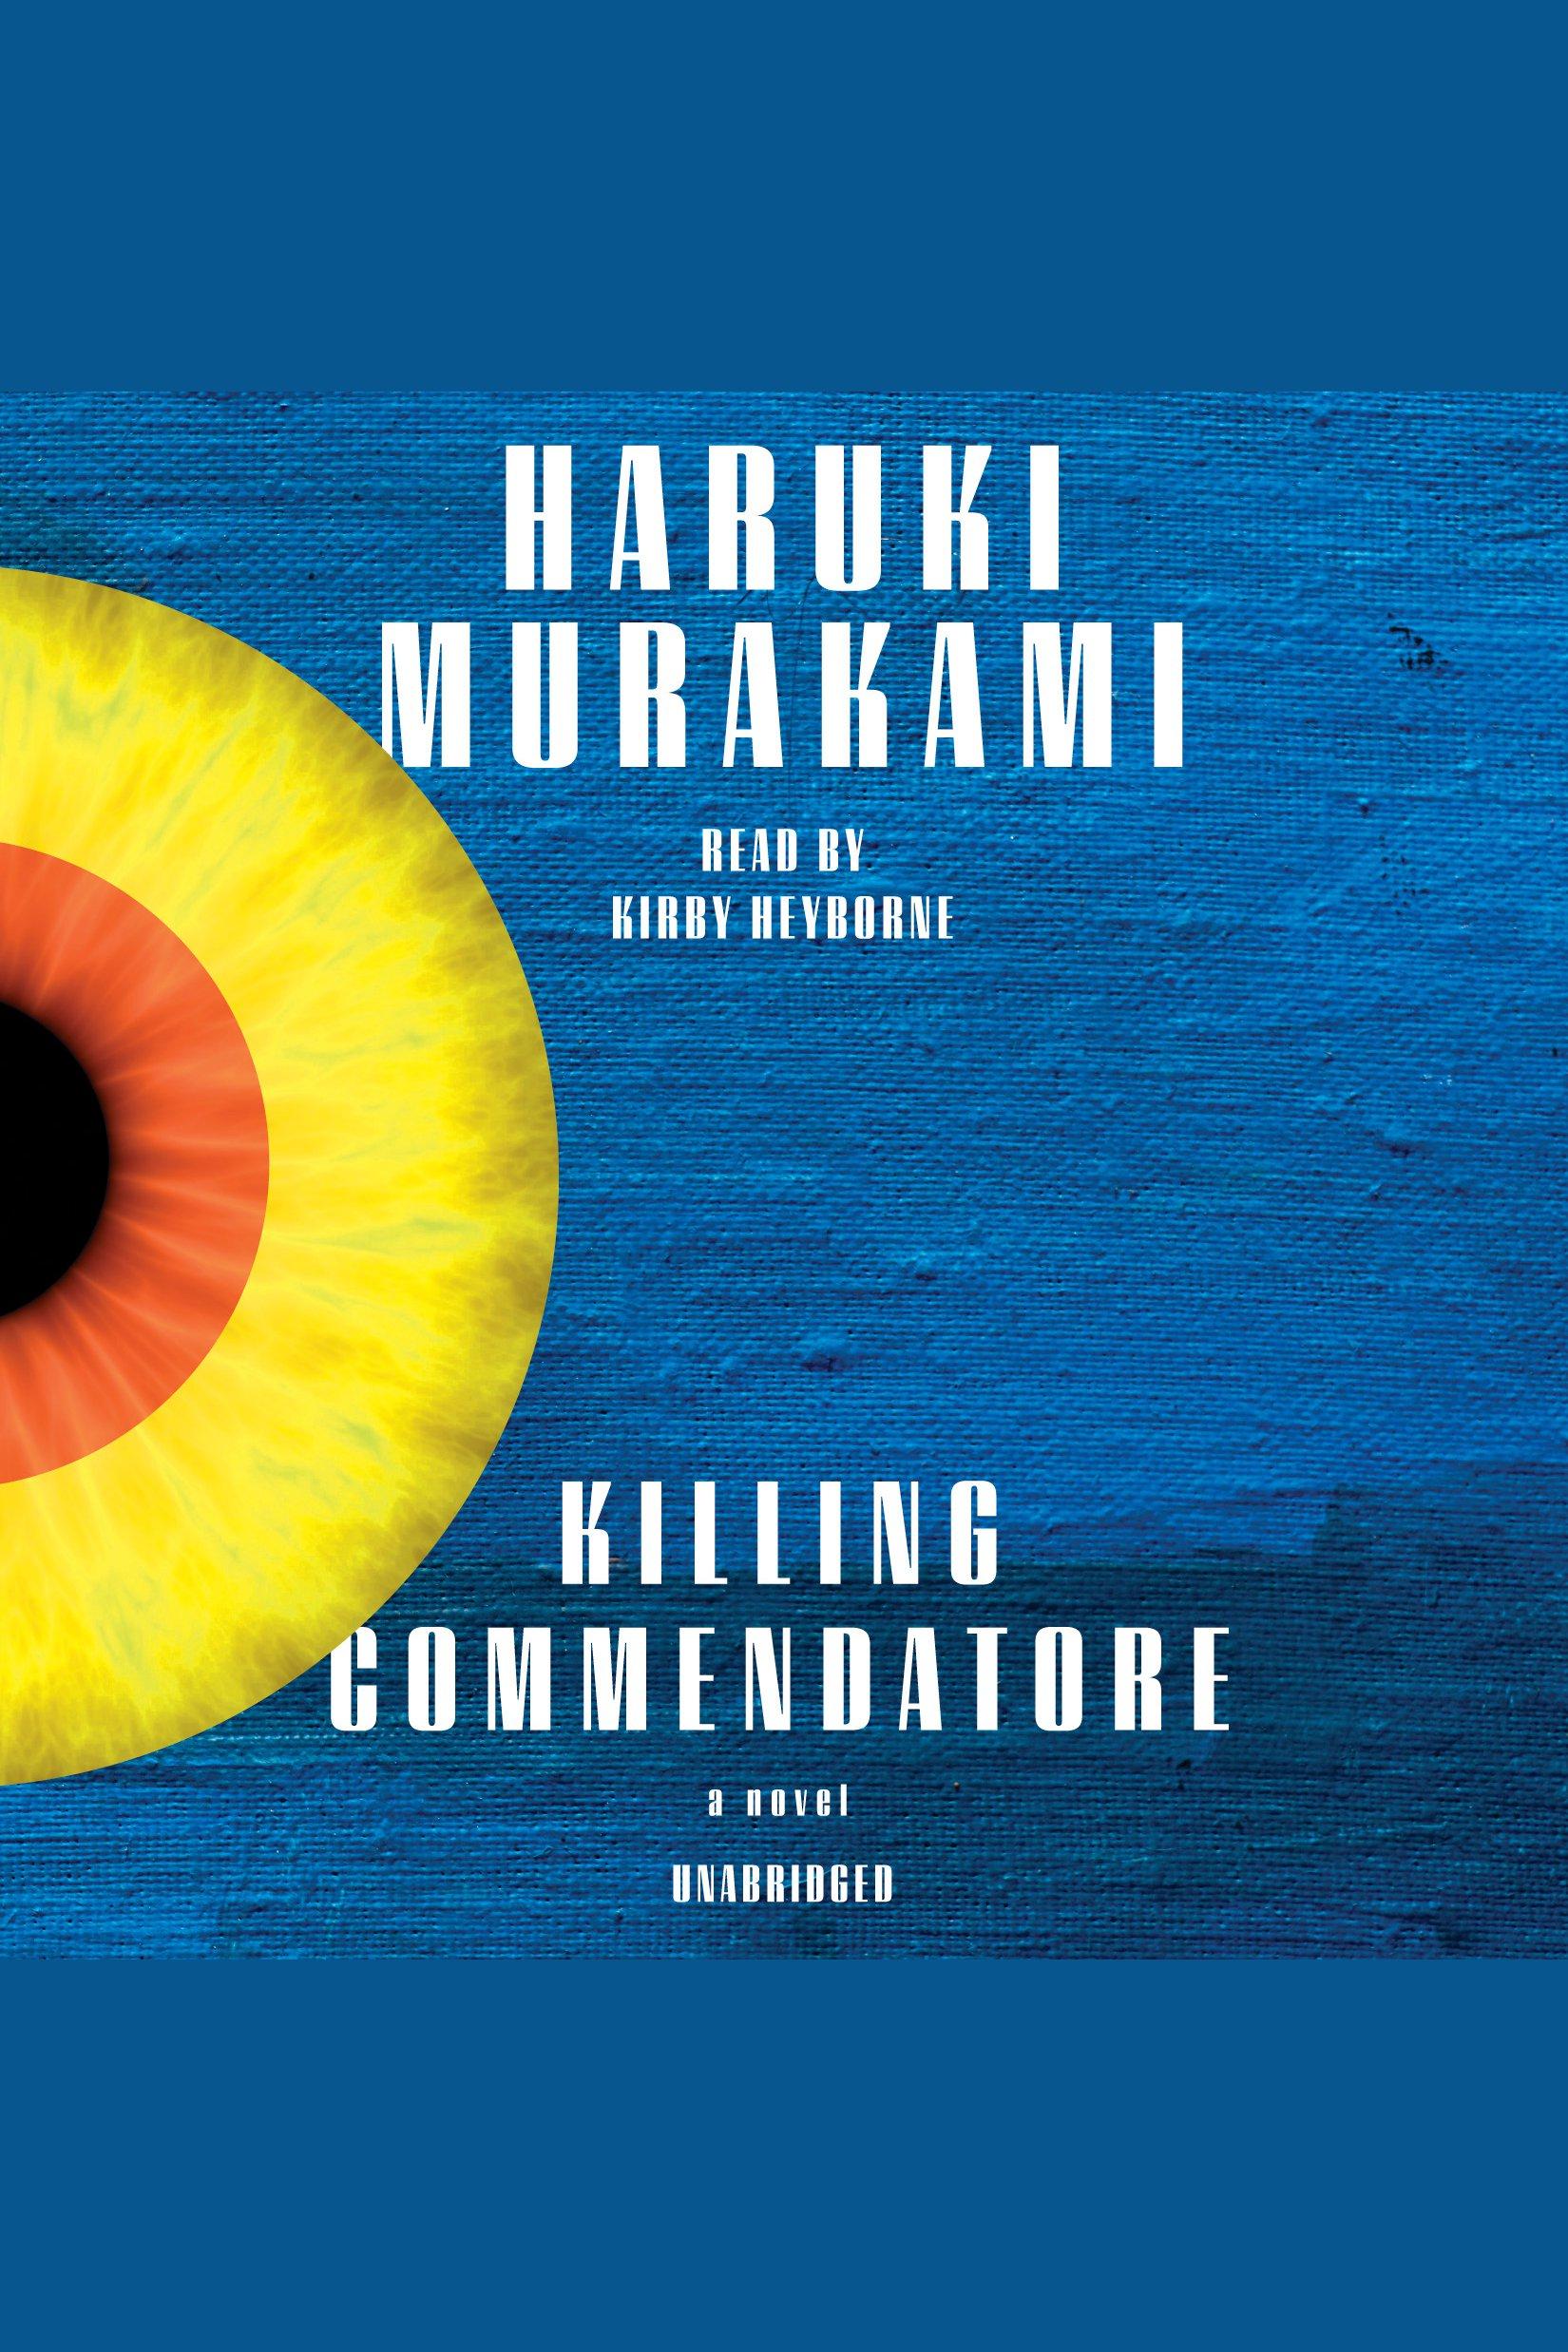 Killing Commendatore [electronic resource] : A novel